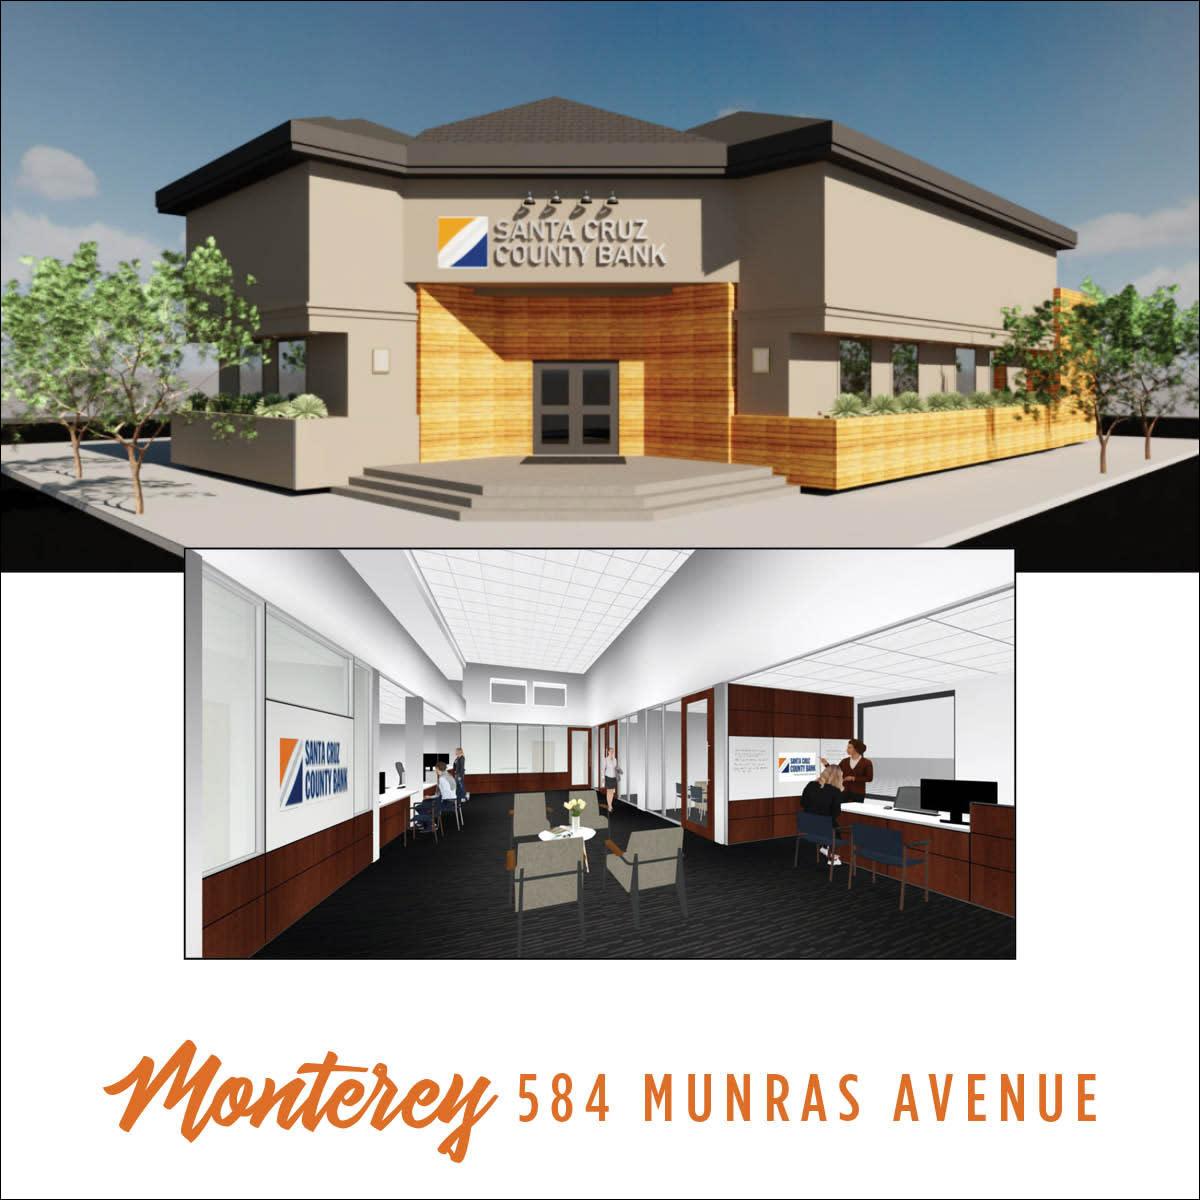 Santa Cruz County Bank Monterey Branch Illustration of Exterior and Interior